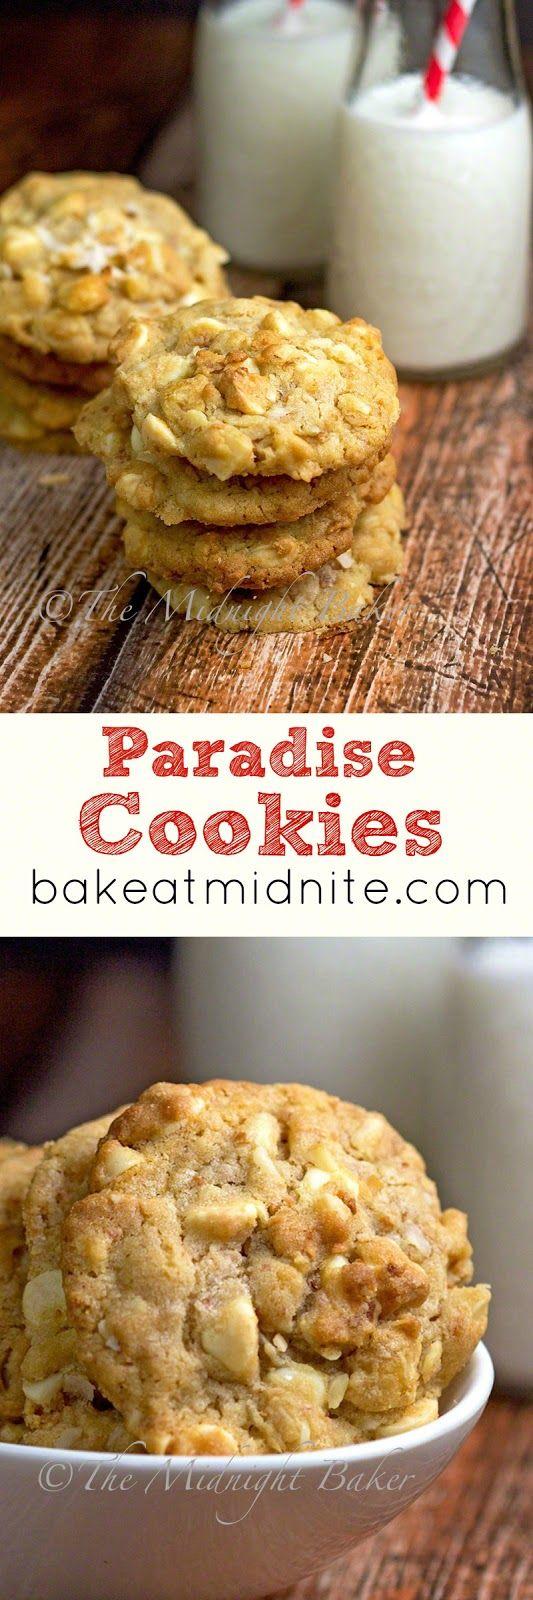 Paradise Cookies   bakeatmidnite.com   #cookierecipes #coconut #macadamianuts #whitechocolate